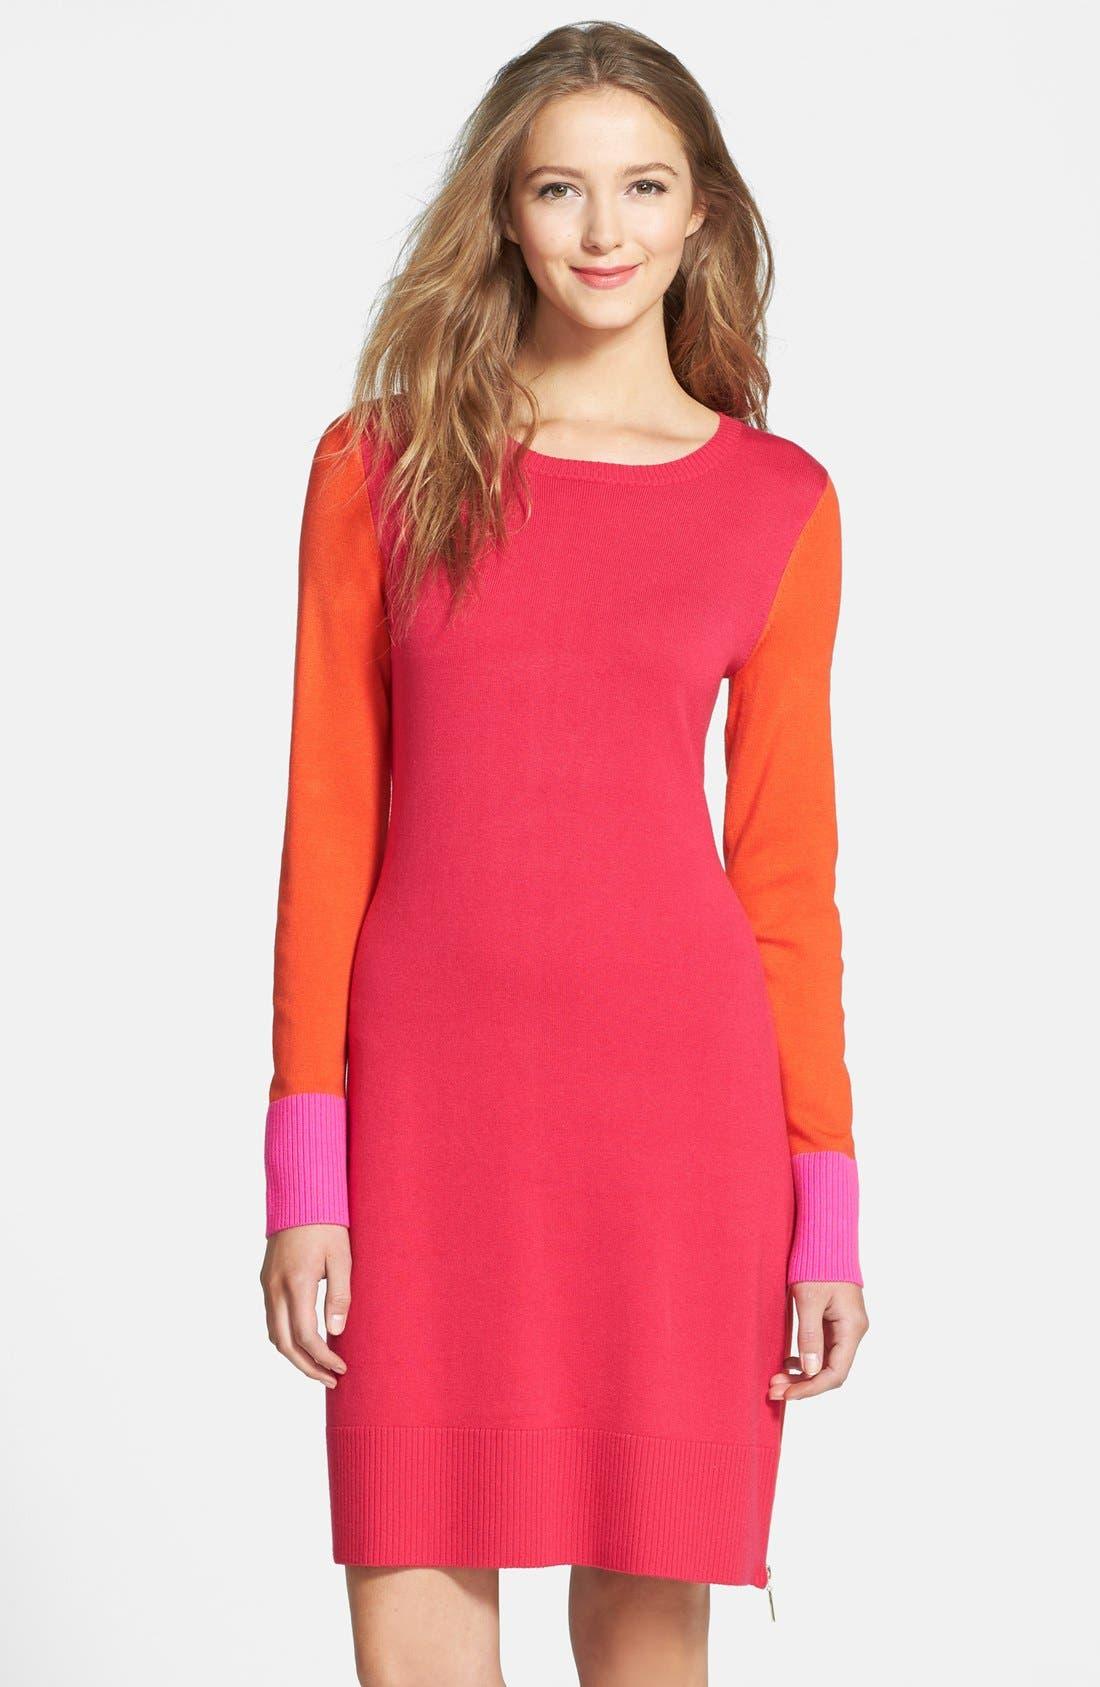 Alternate Image 1 Selected - Eliza J Colorblock Long Sleeve Sweater Dress (Regular & Petite)